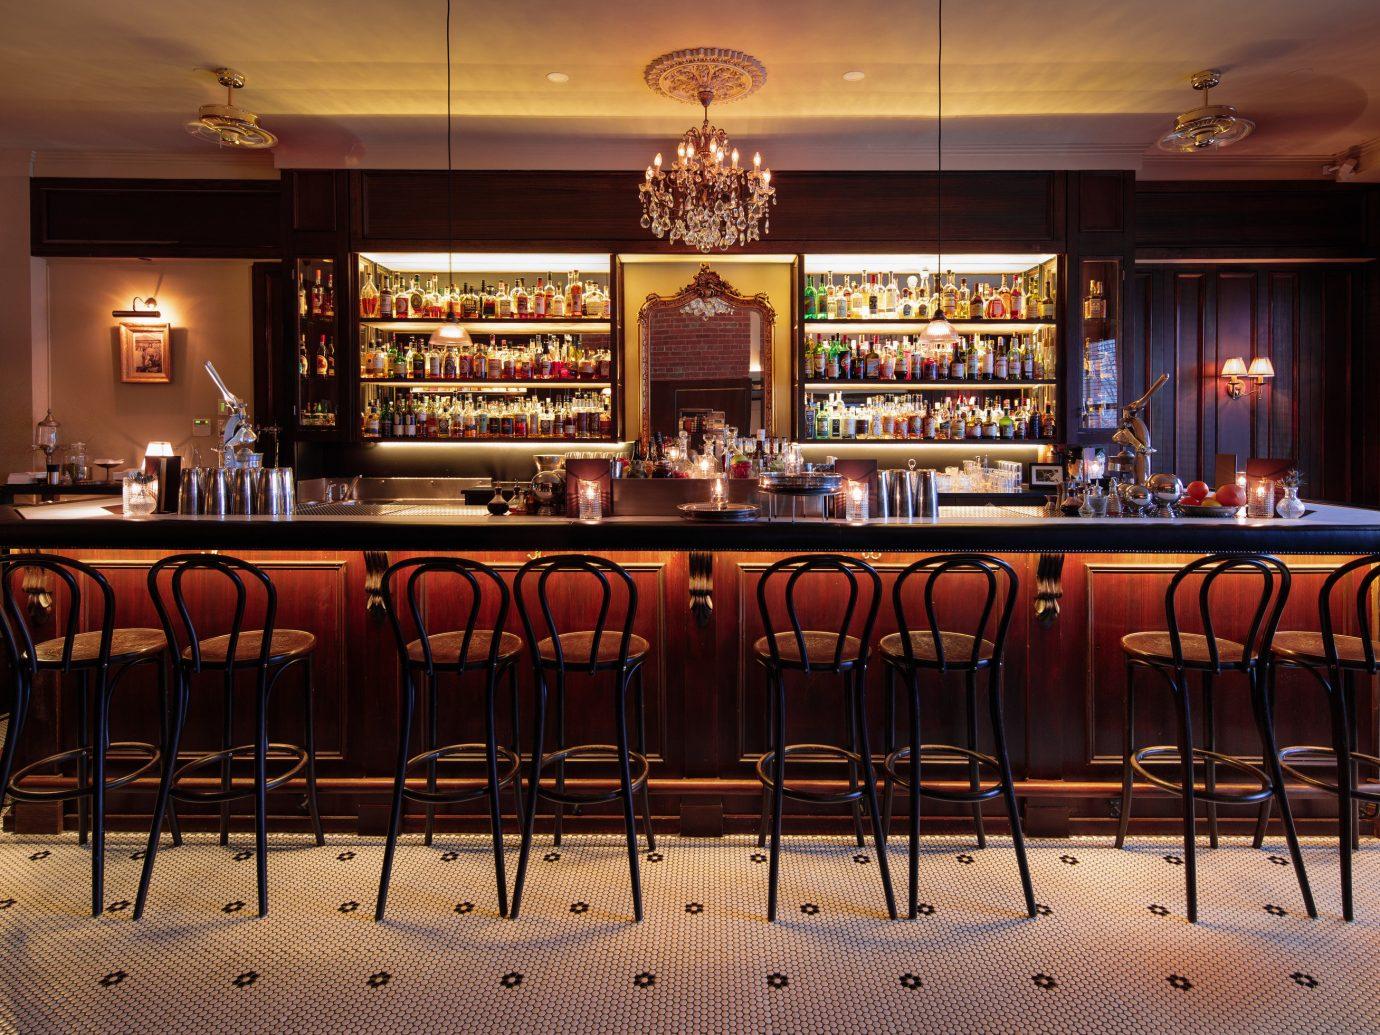 Offbeat Trip Ideas ceiling indoor table Bar interior design restaurant dining room Dining café area